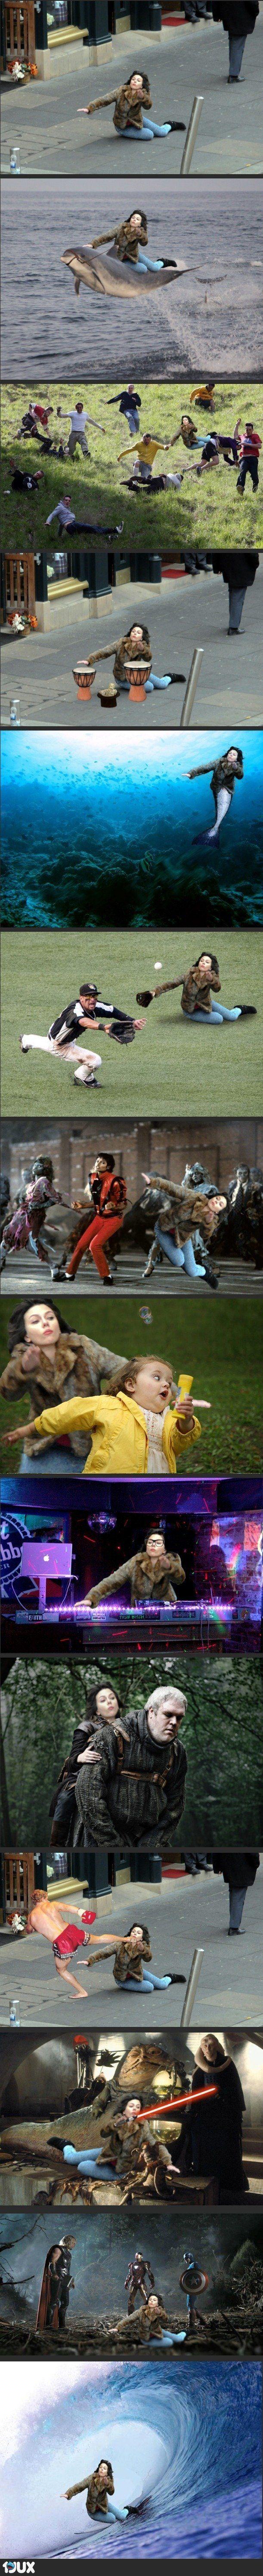 Scarlett Johansson Fell and it Became the Best Meme Ever... :D